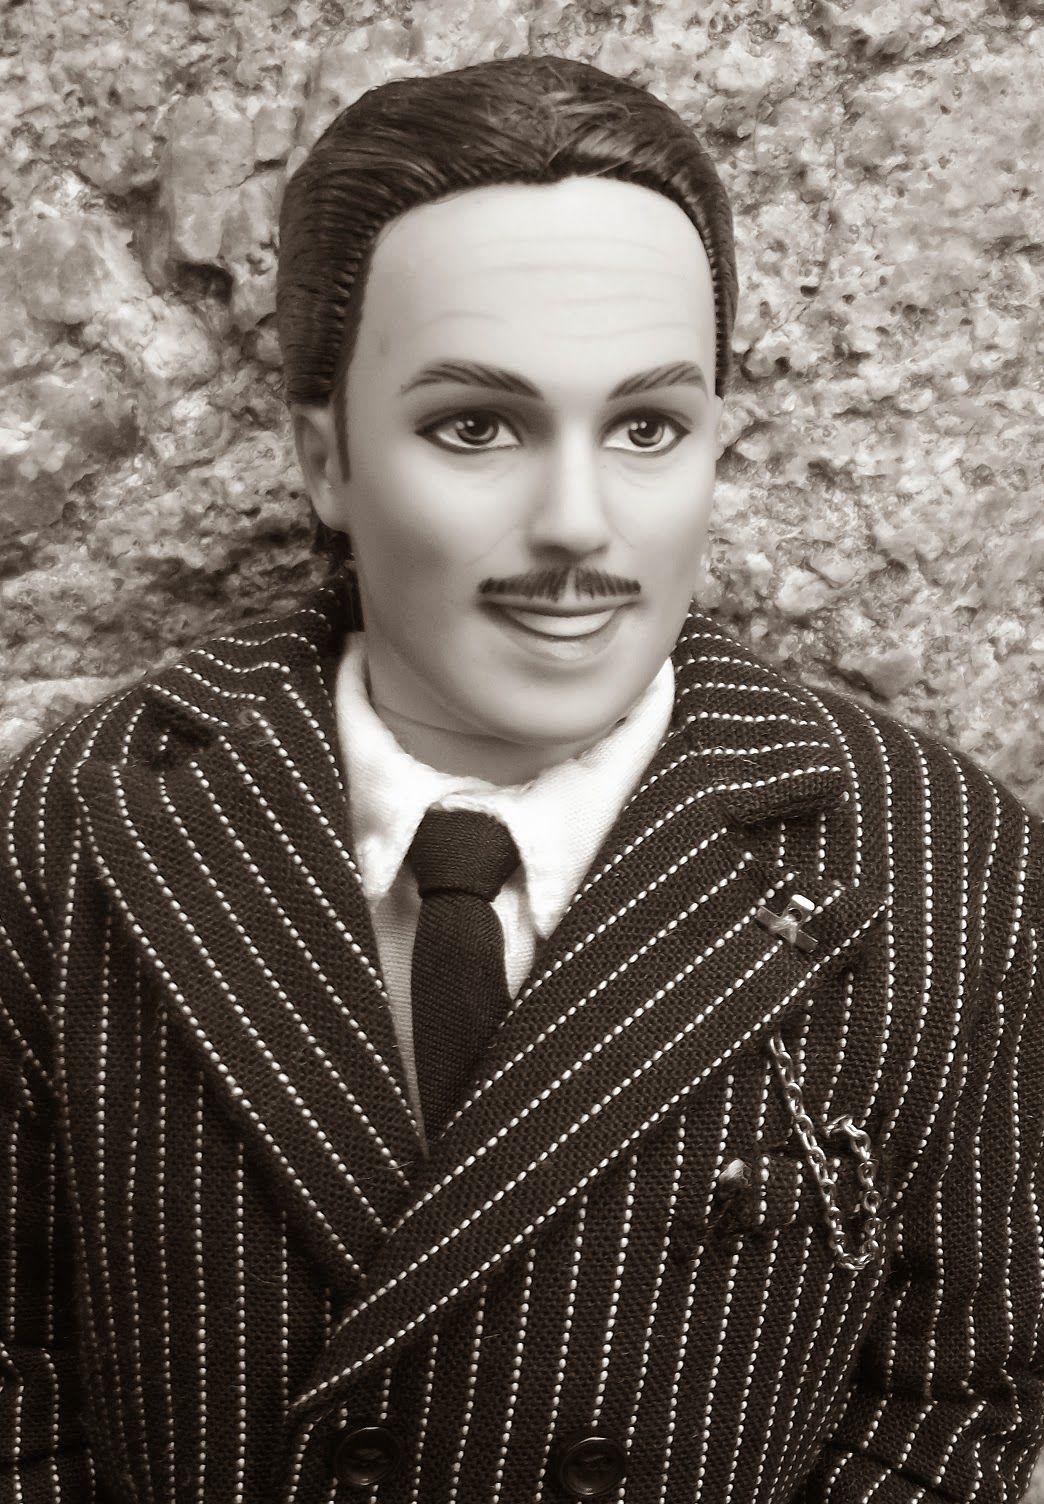 Gomez Addams, Mattel